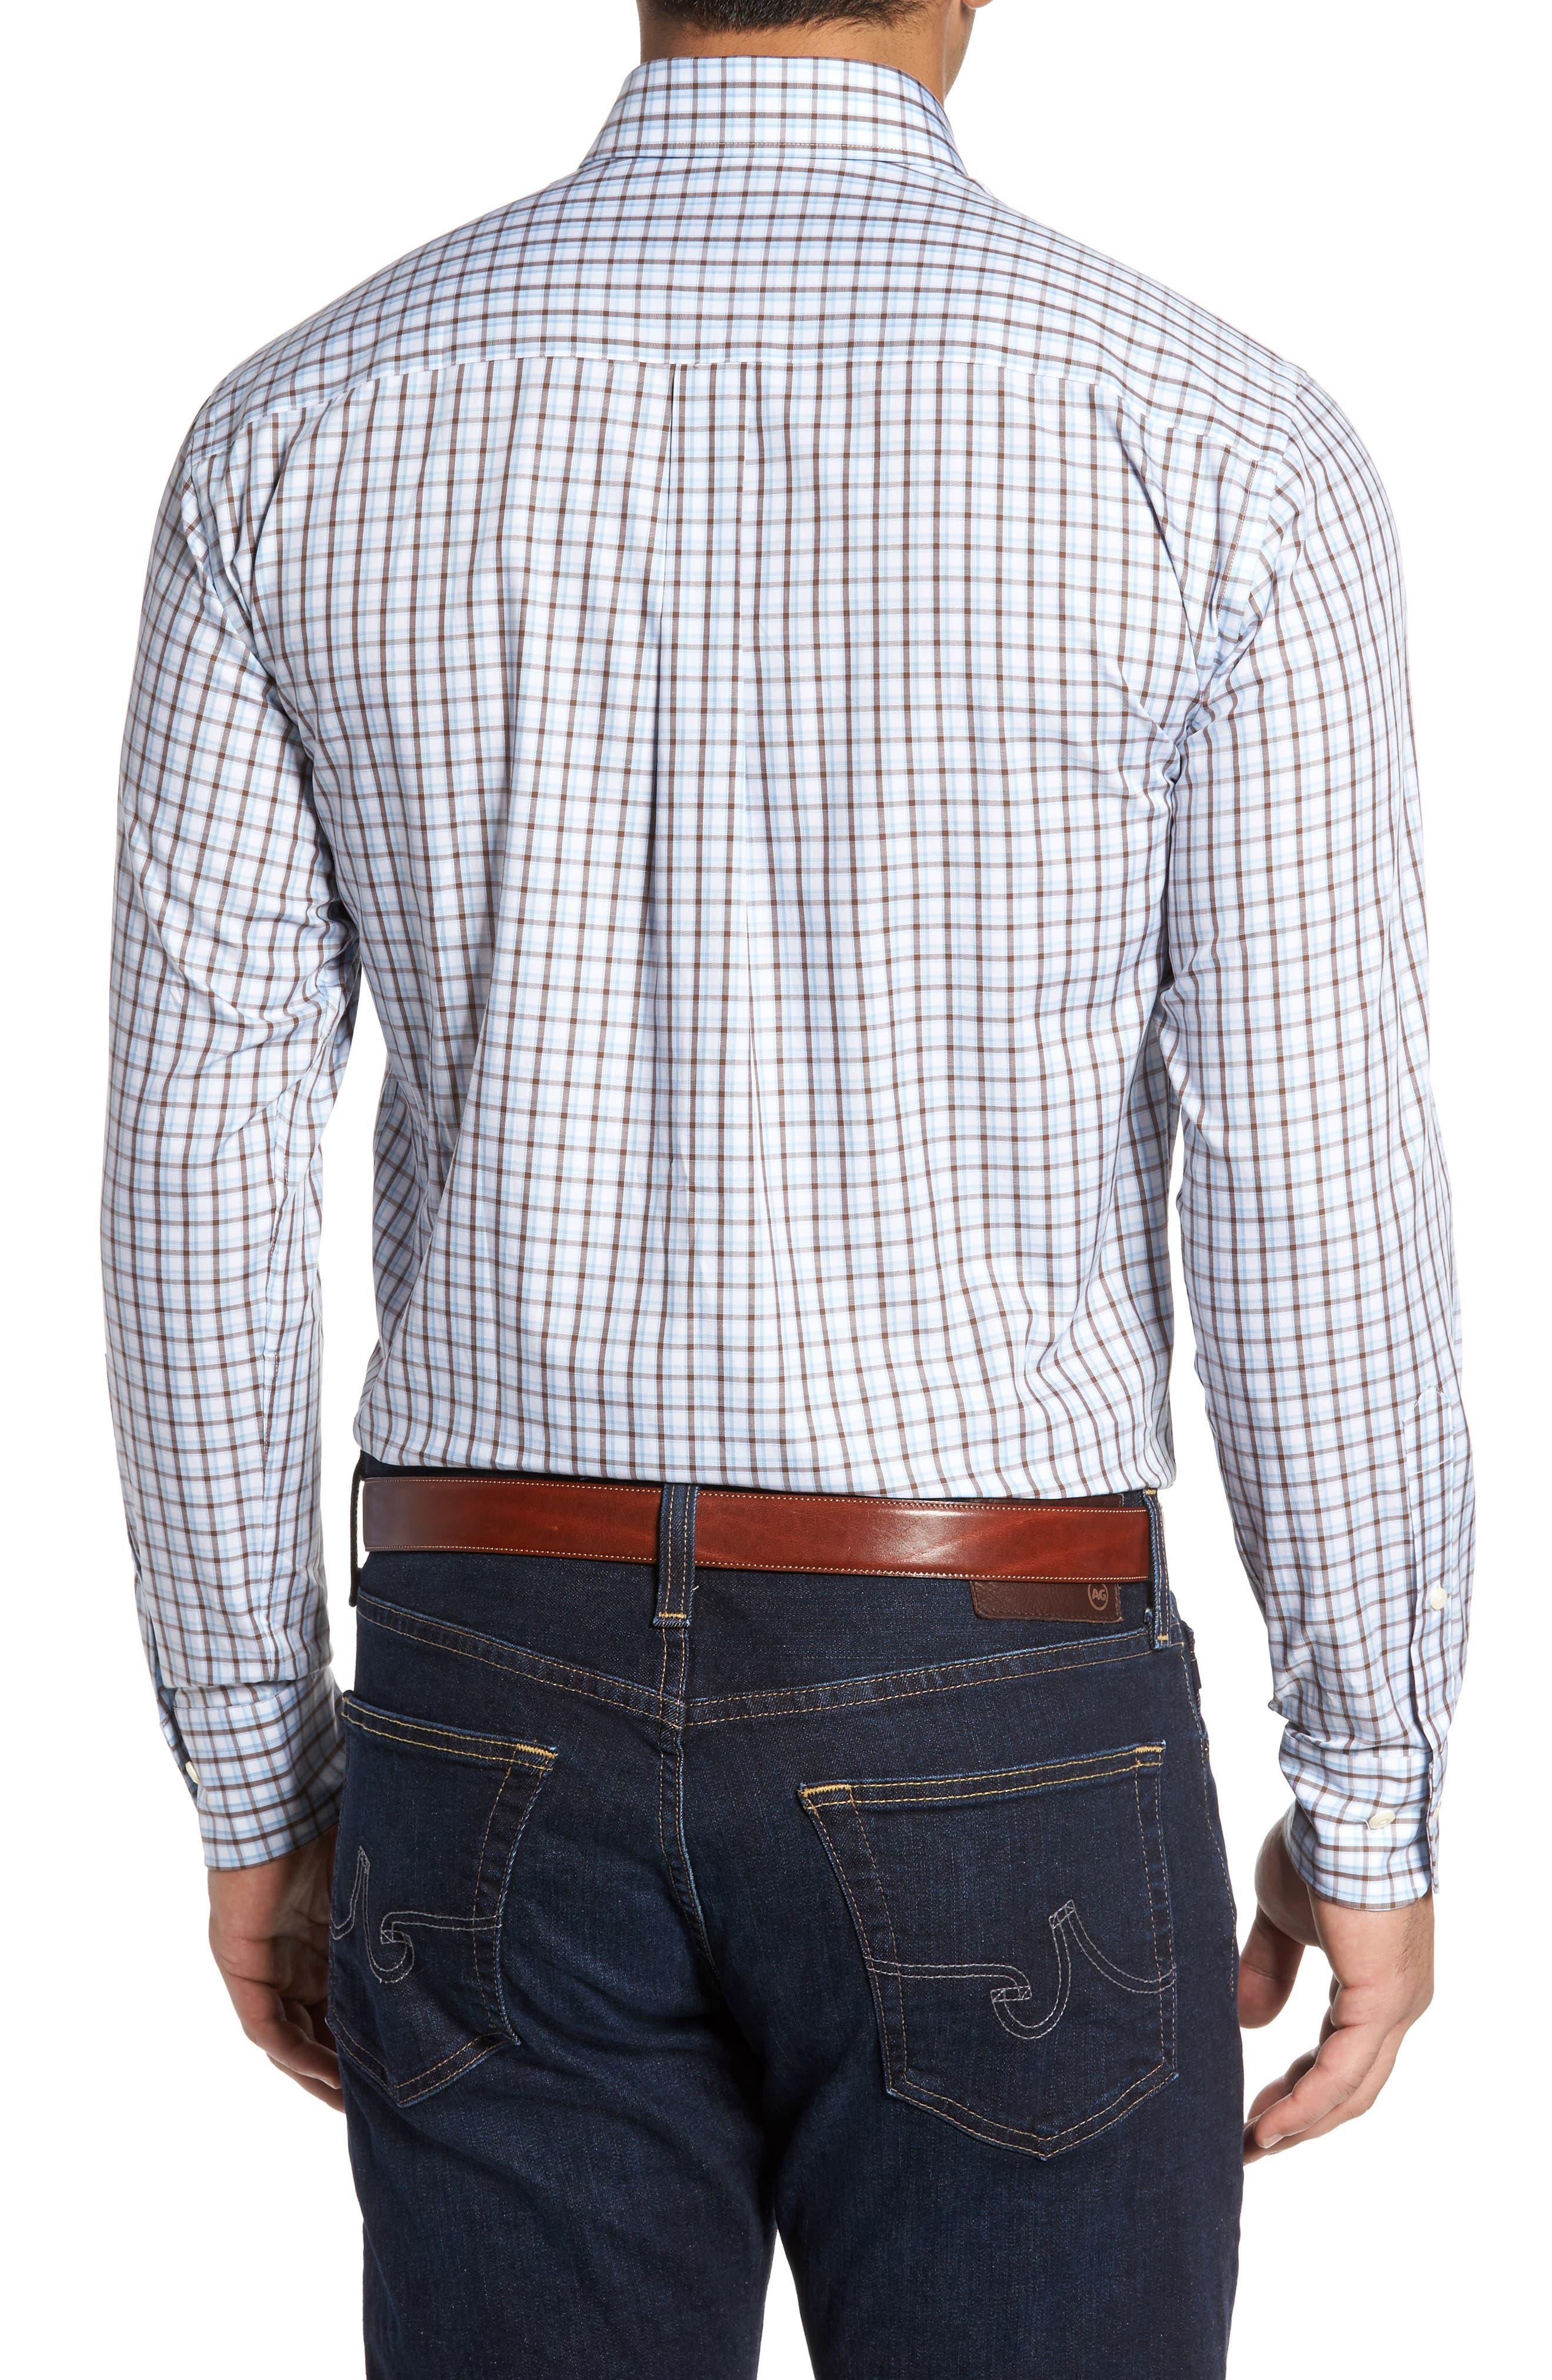 Regular Fit Crisp Pane Sport Shirt,                             Alternate thumbnail 3, color,                             Branch